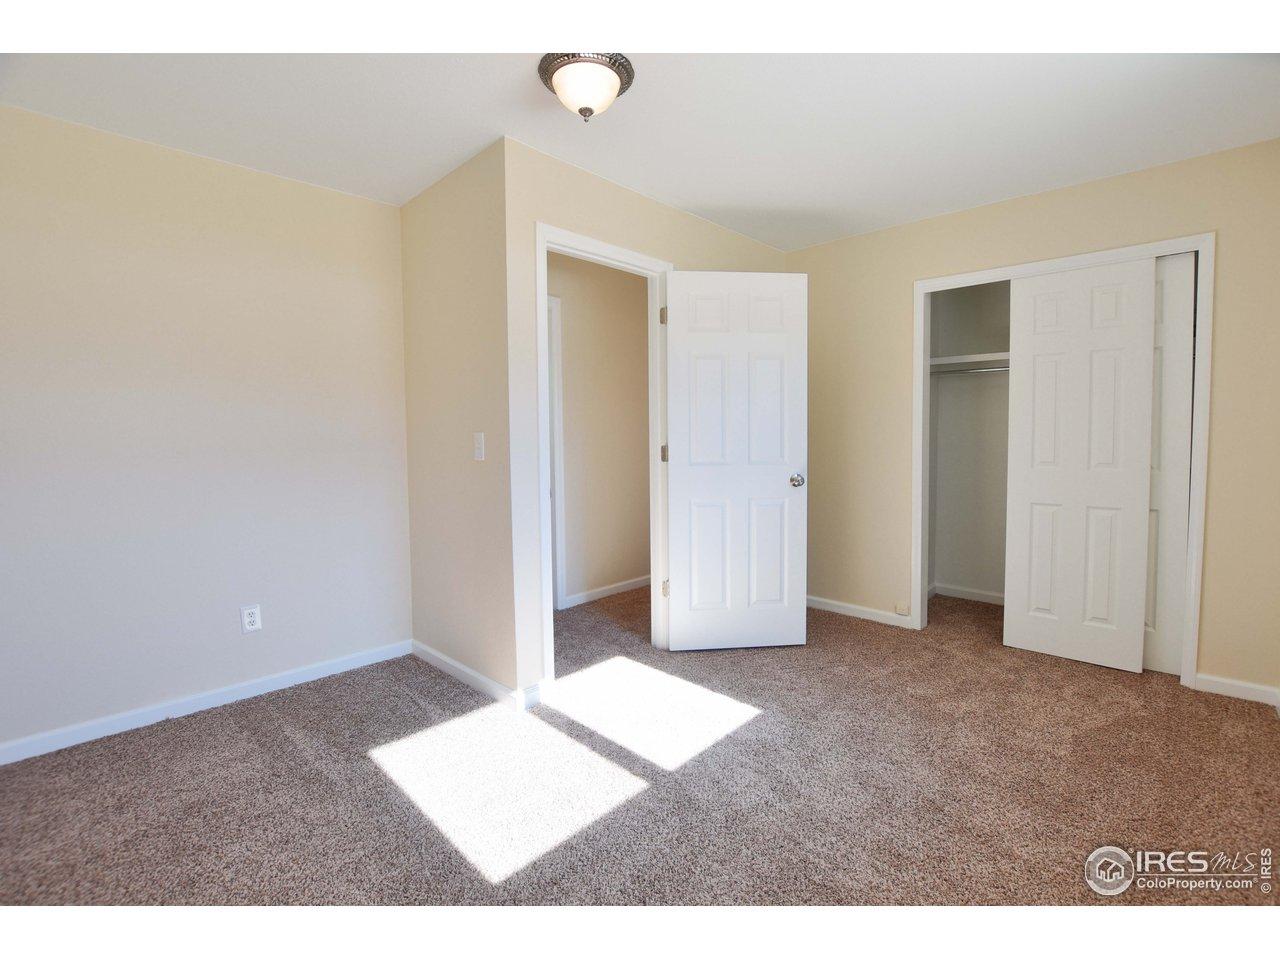 3/4 lower level bathroom